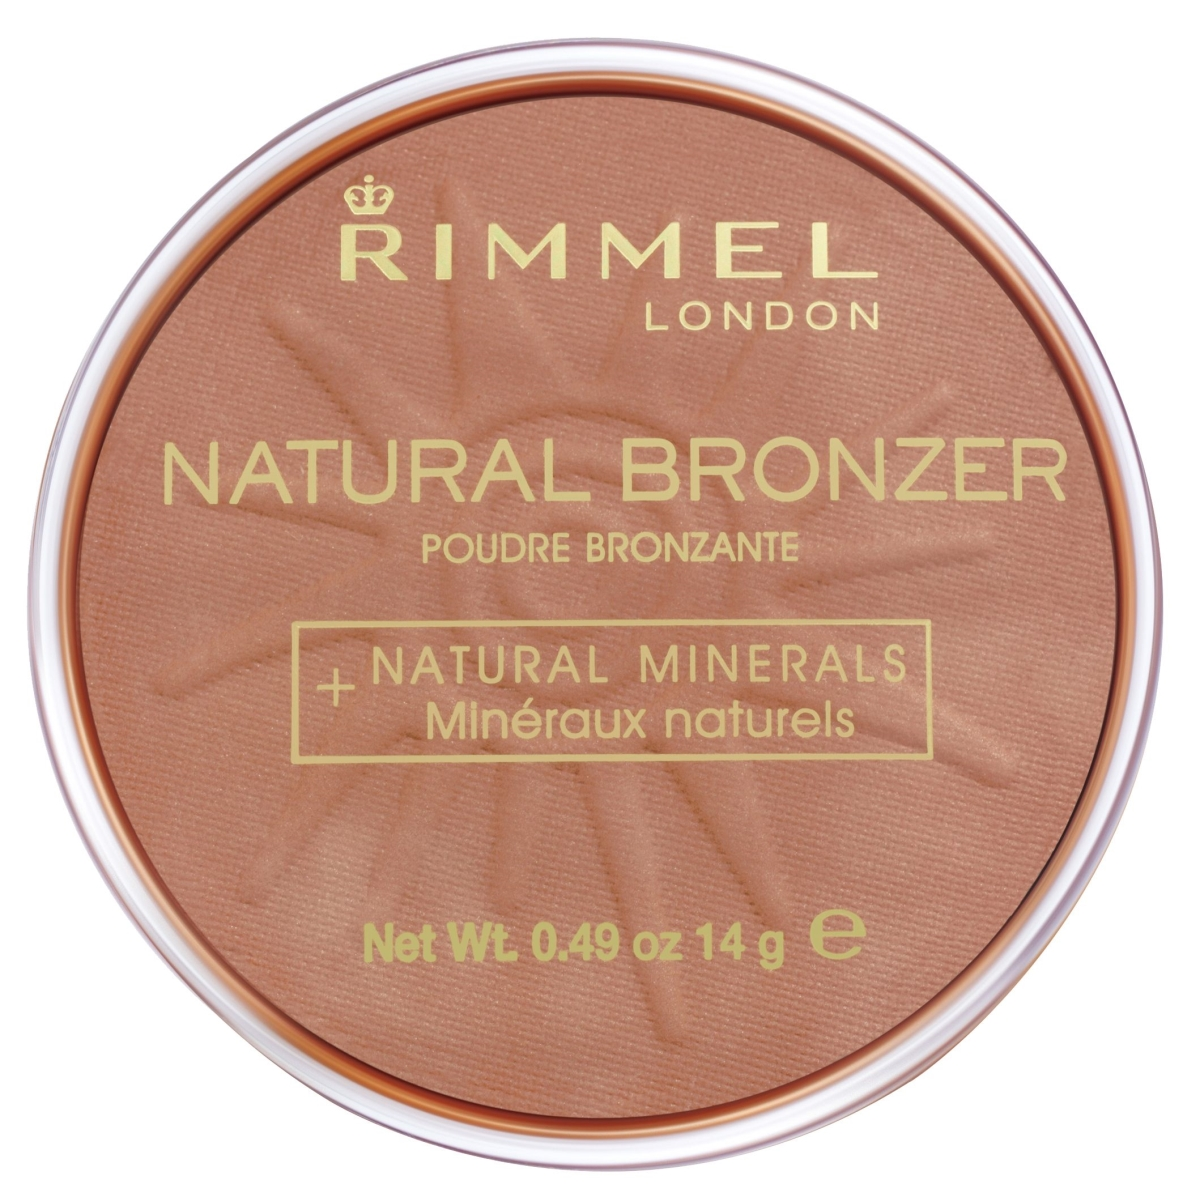 Rimmel London RILCR3 1 oz BB Cream Super Makeup Medium